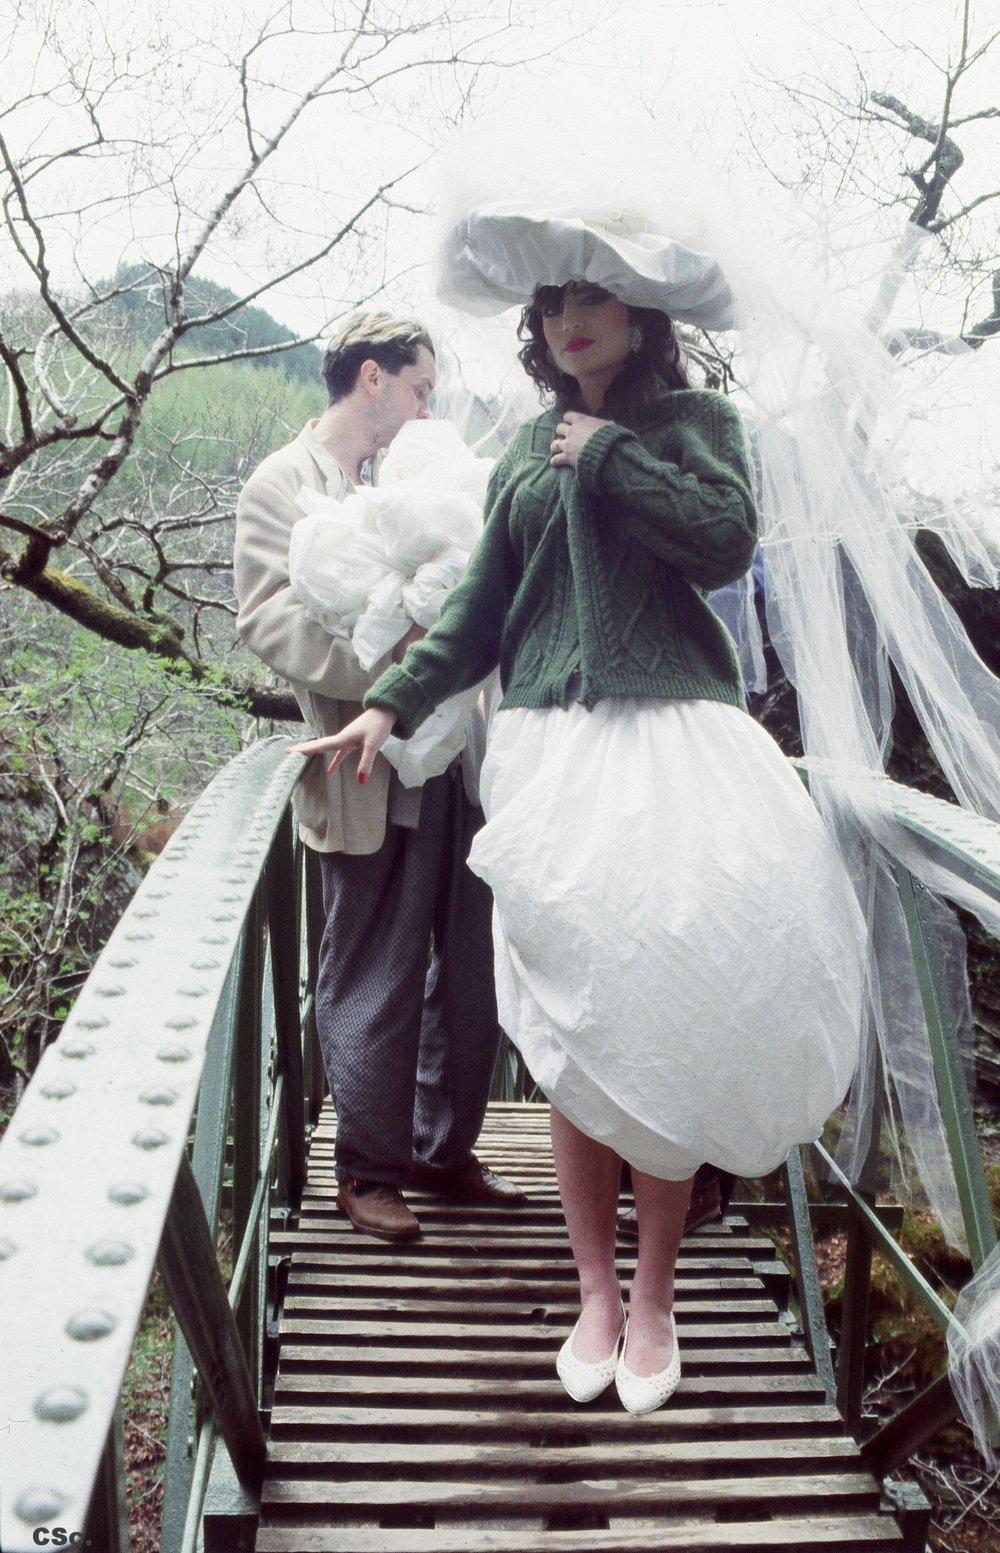 Devil's Bridge North Wales, 1985, documentary photo by Deborah Weinreb